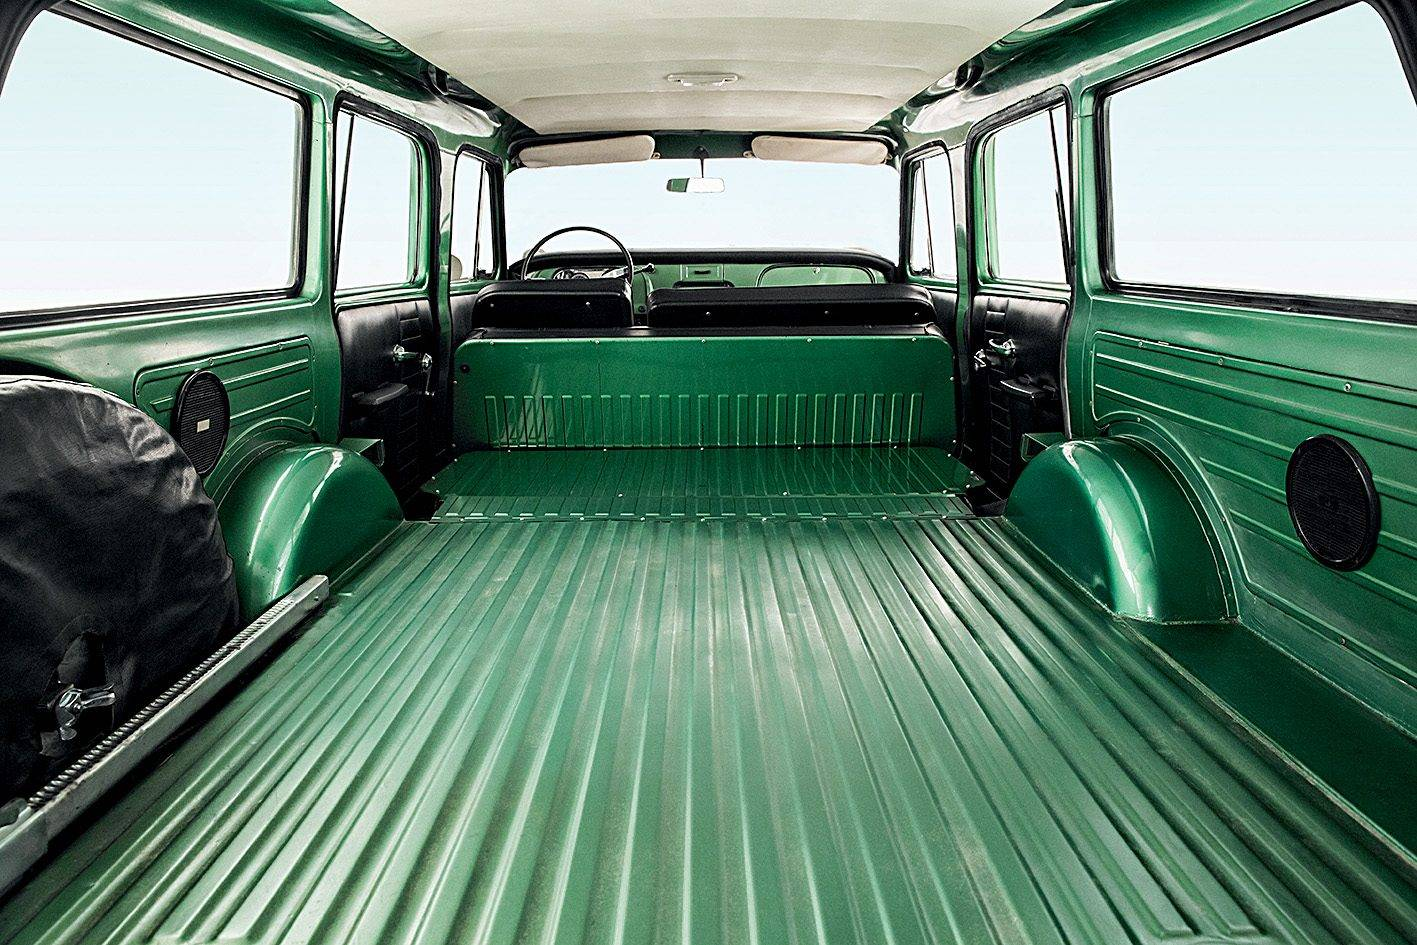 Chevrolet-Veraneio--1964--1994-C-1416-4